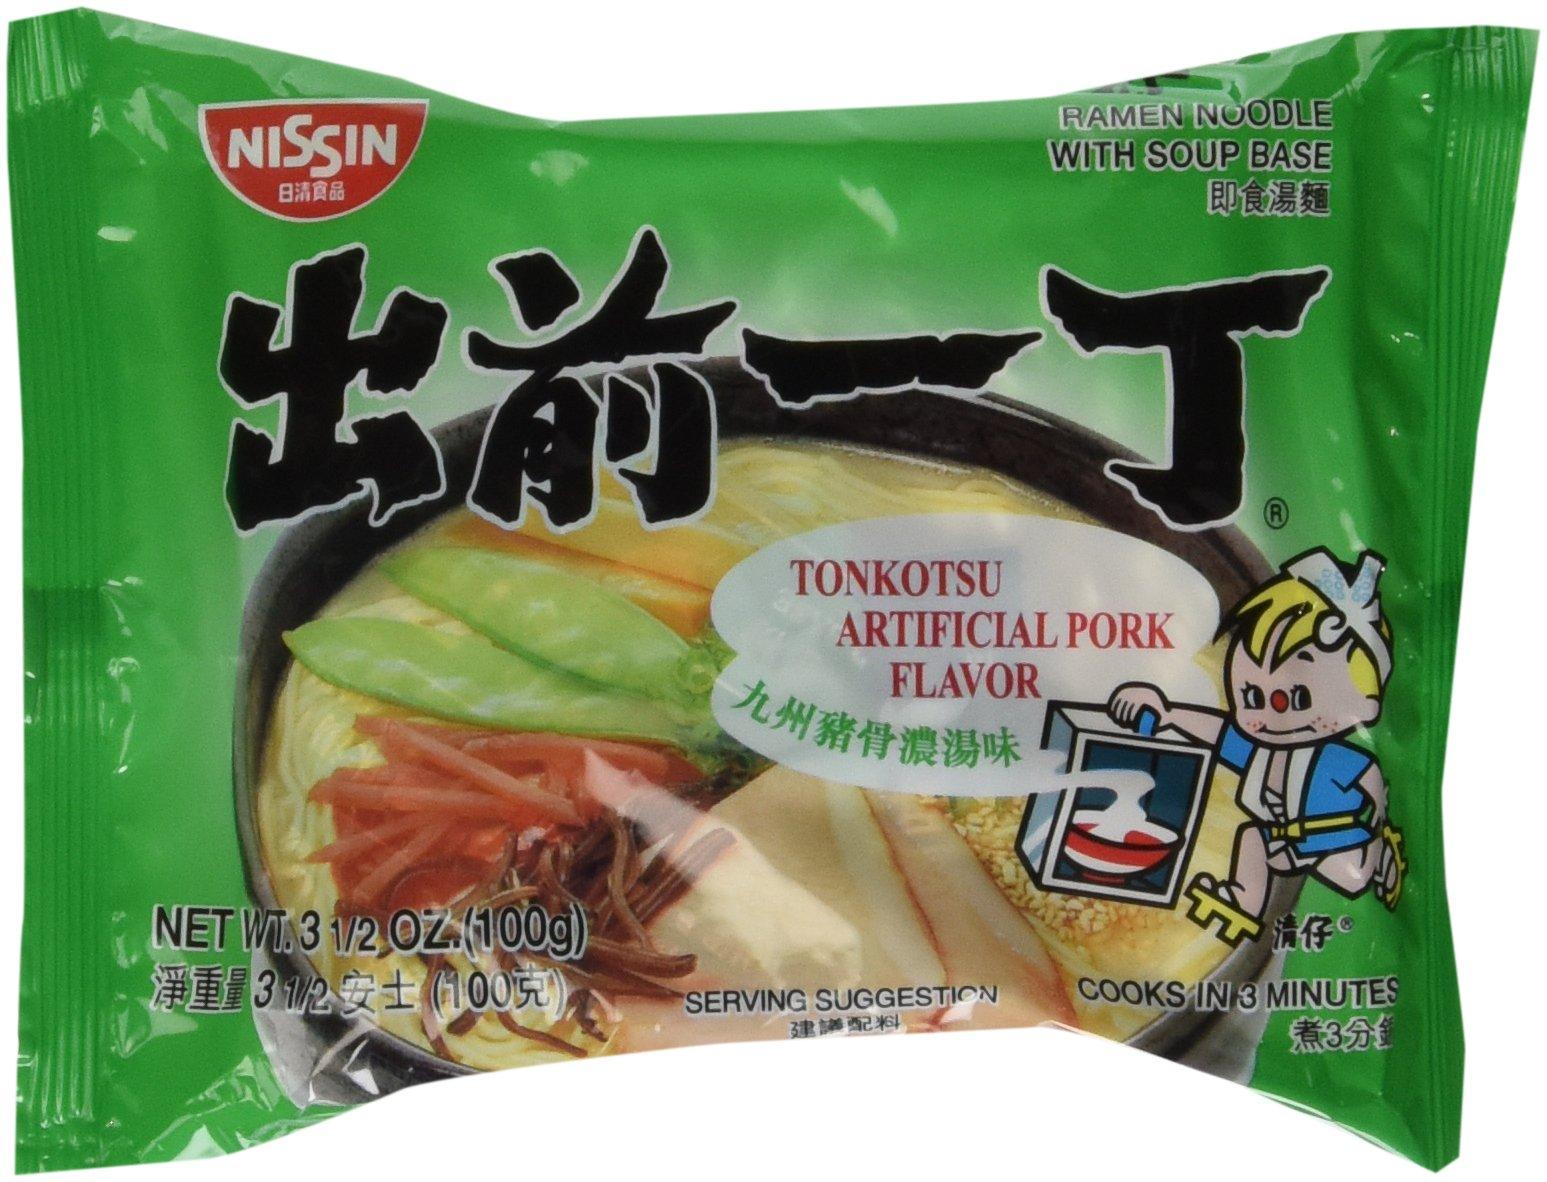 Nissin, Demae Ramen, Tonkotsu Pork, 3.5 oz by Nissin